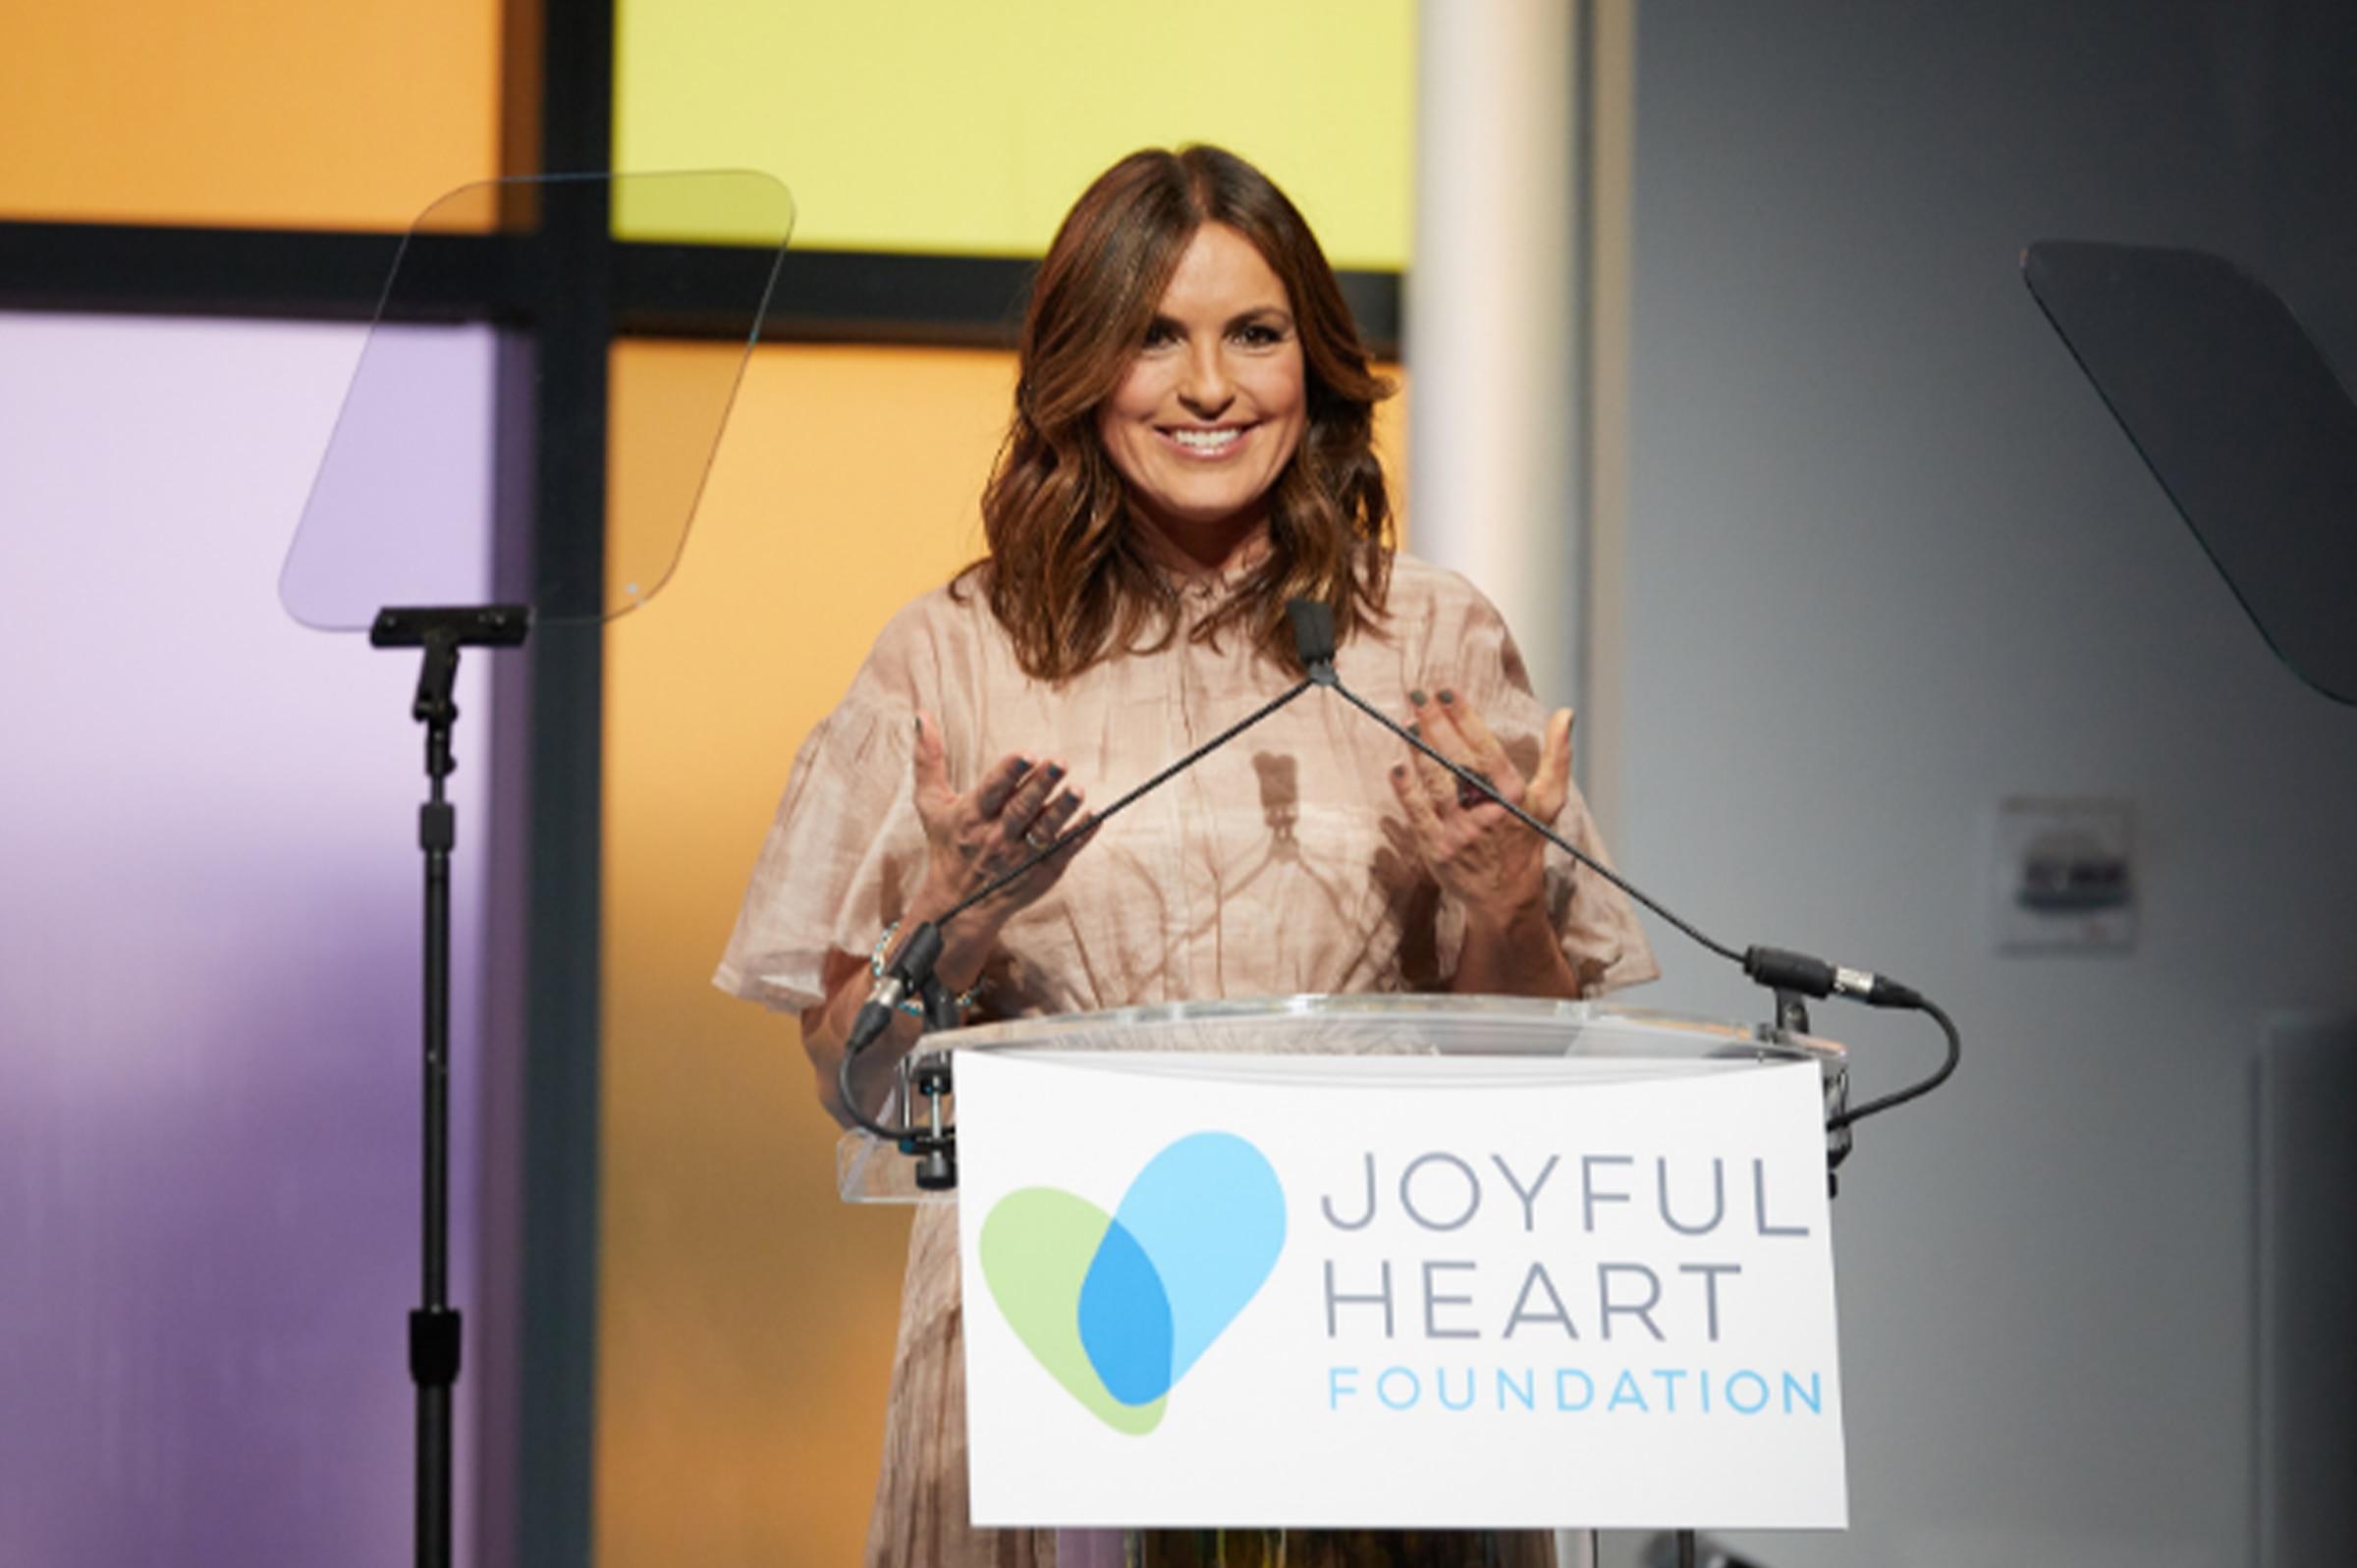 Joyful Heart Foundation